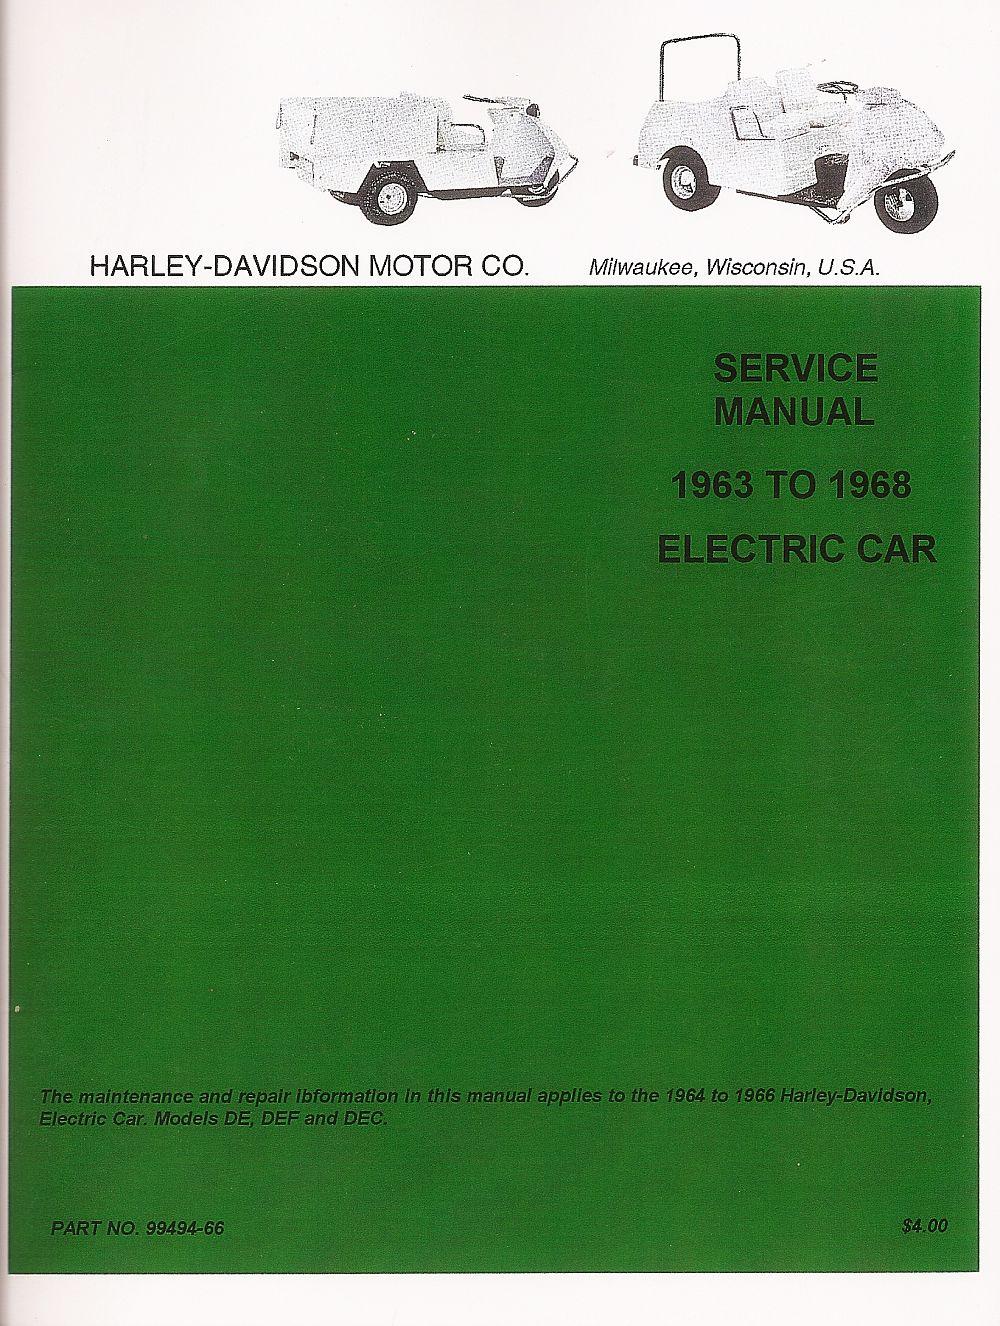 Pu11 002 Electric Service Manual 63 68 Vintage Golf Cart